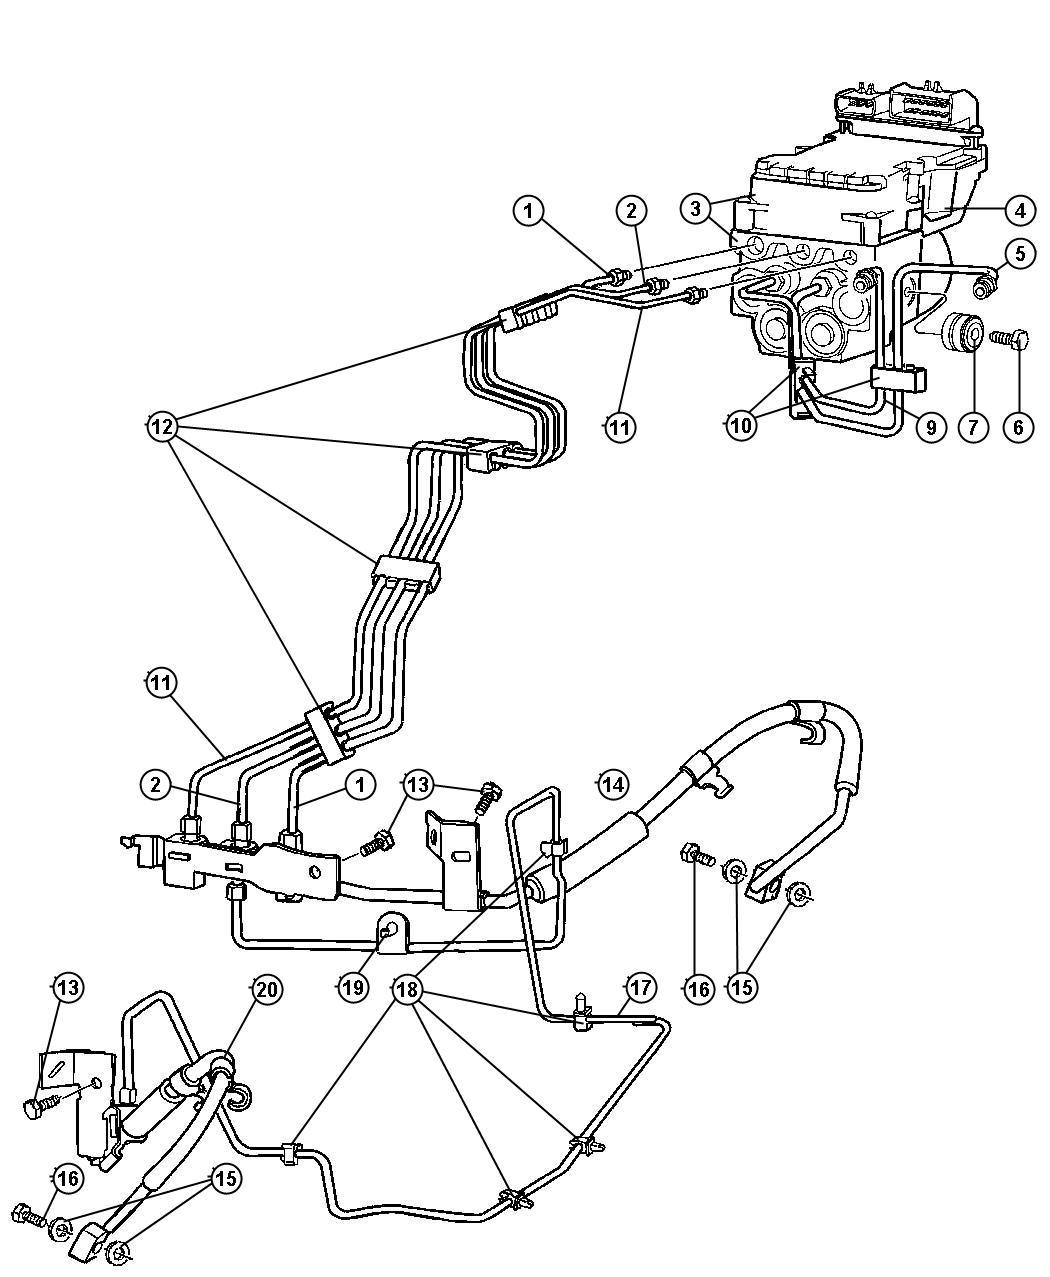 DIAGRAM] Wiring Diagram Abs System 1997 Dodge 1500 FULL Version HD Quality Dodge  1500 - PLANTDIAGRAM.TESCOMAITALIABLOG.ITIl blog di Tescoma Italia